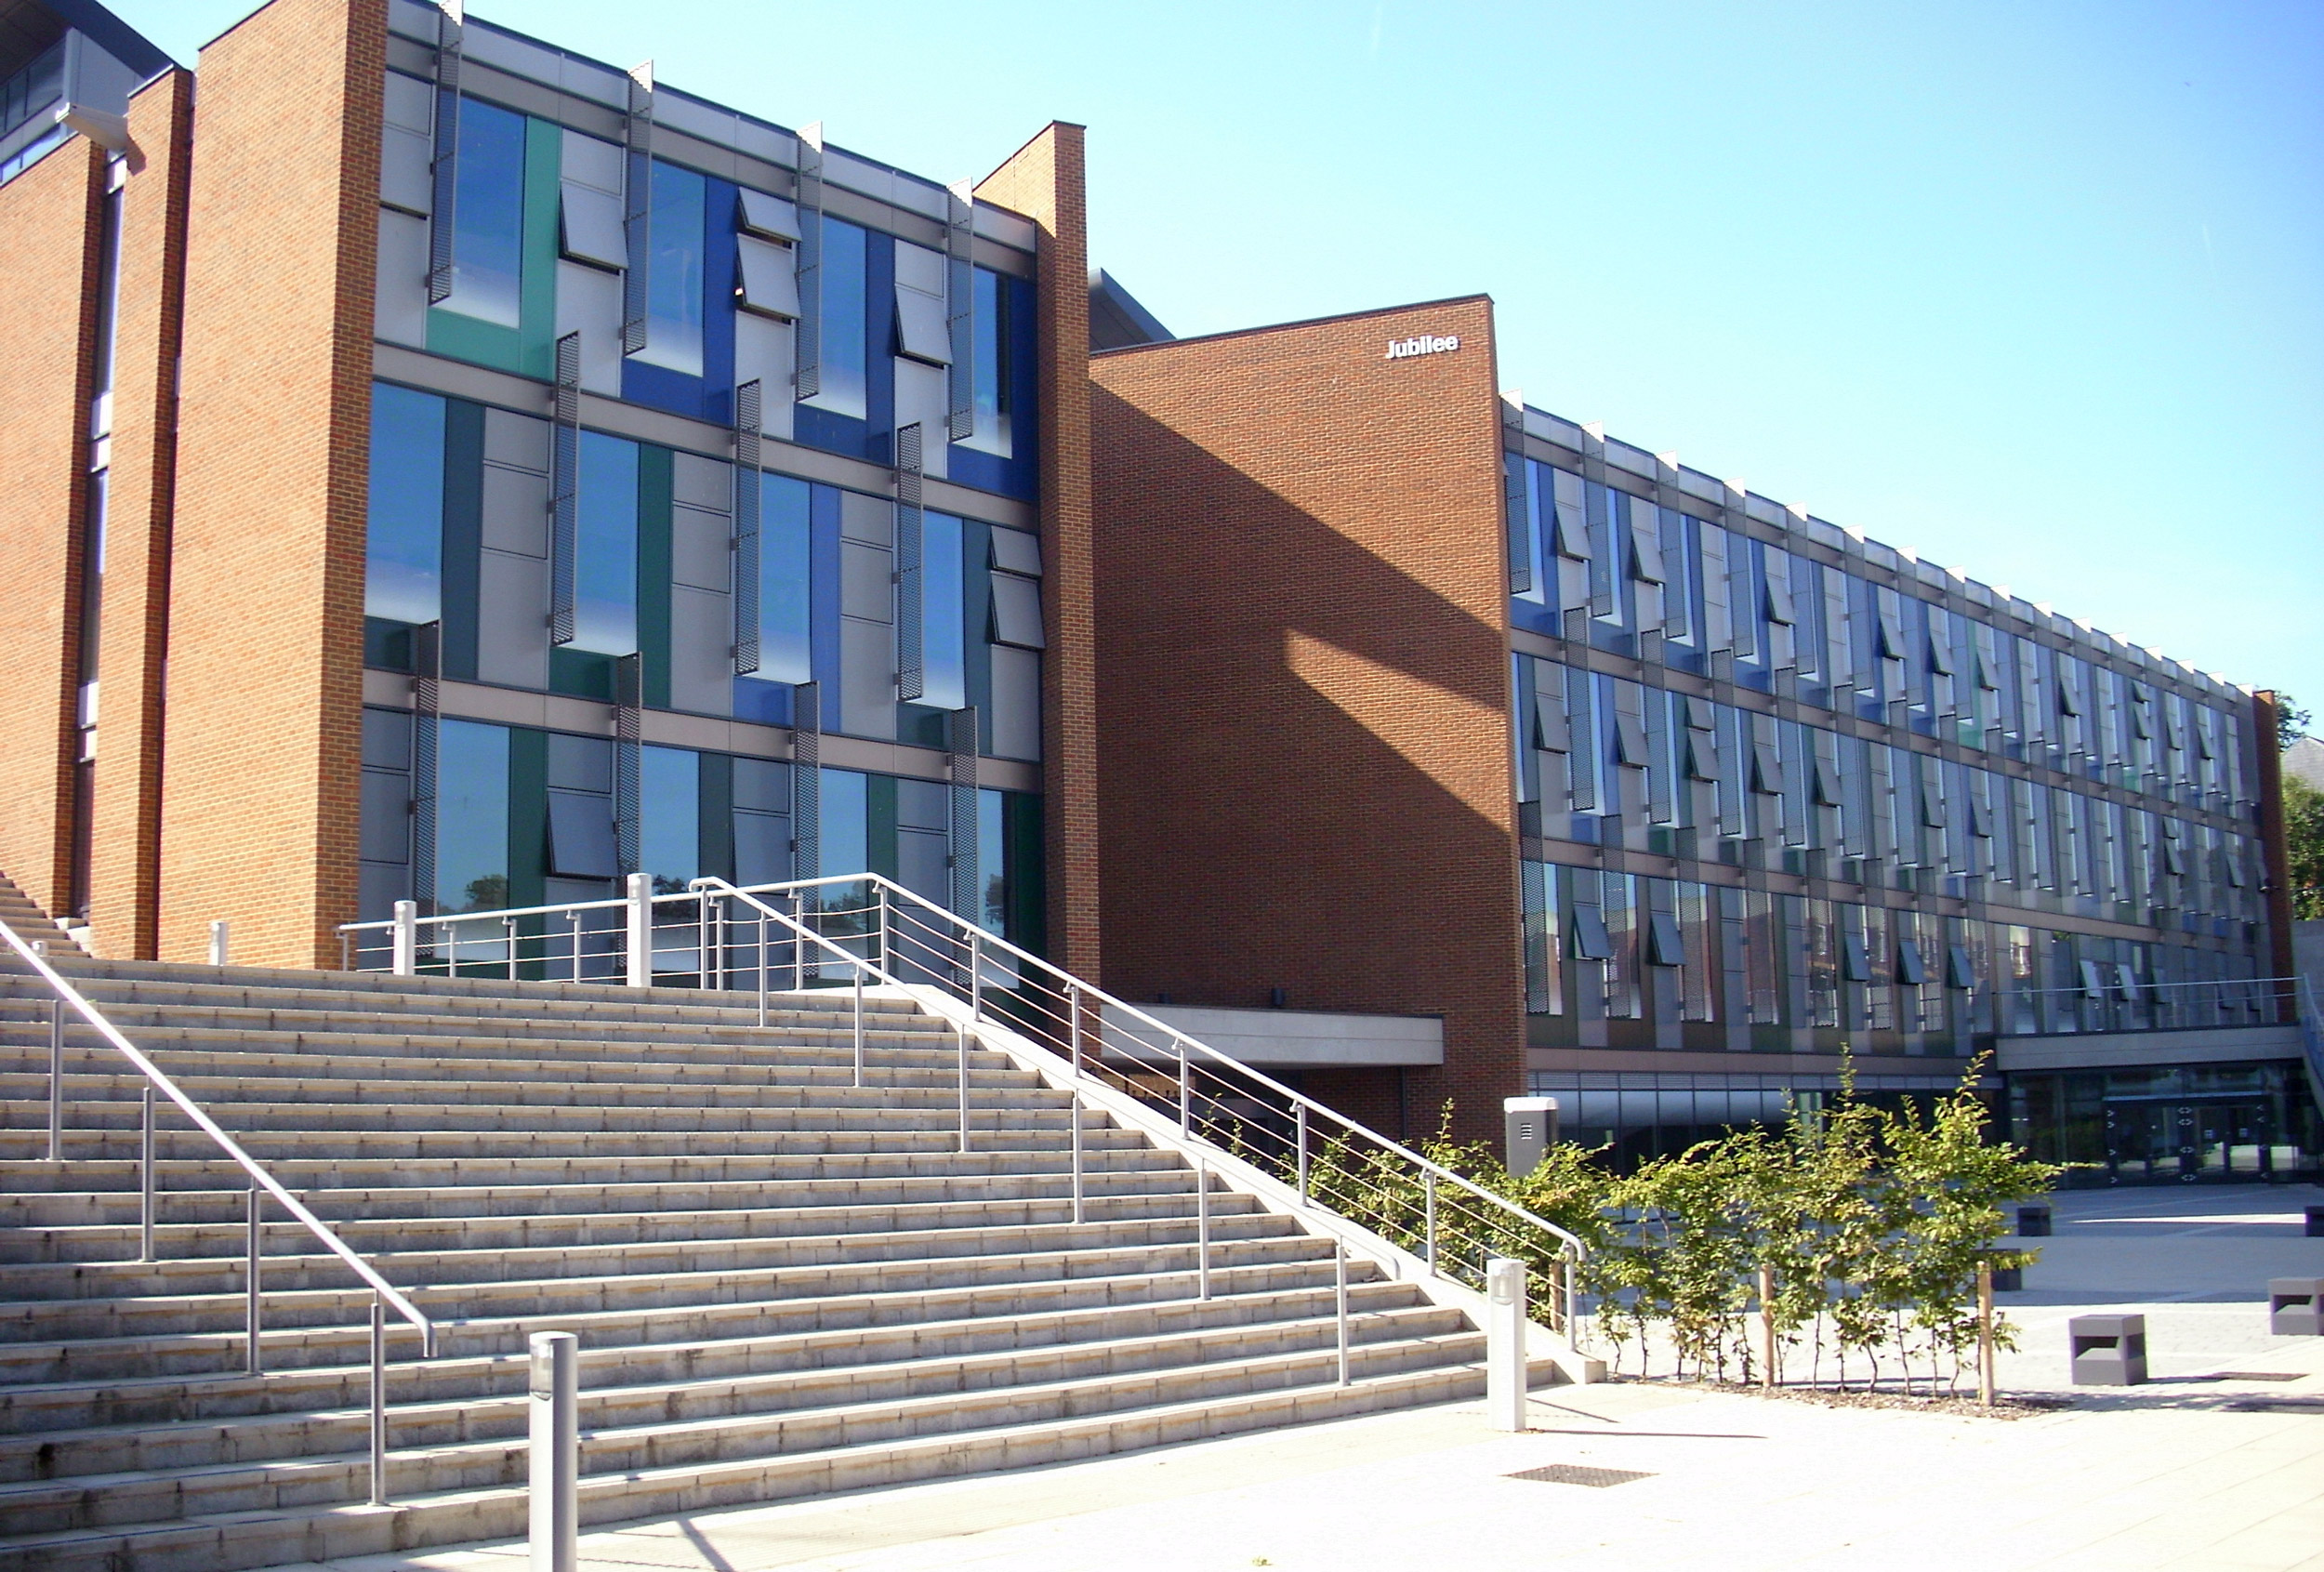 Jubilee Building, University of Sussex